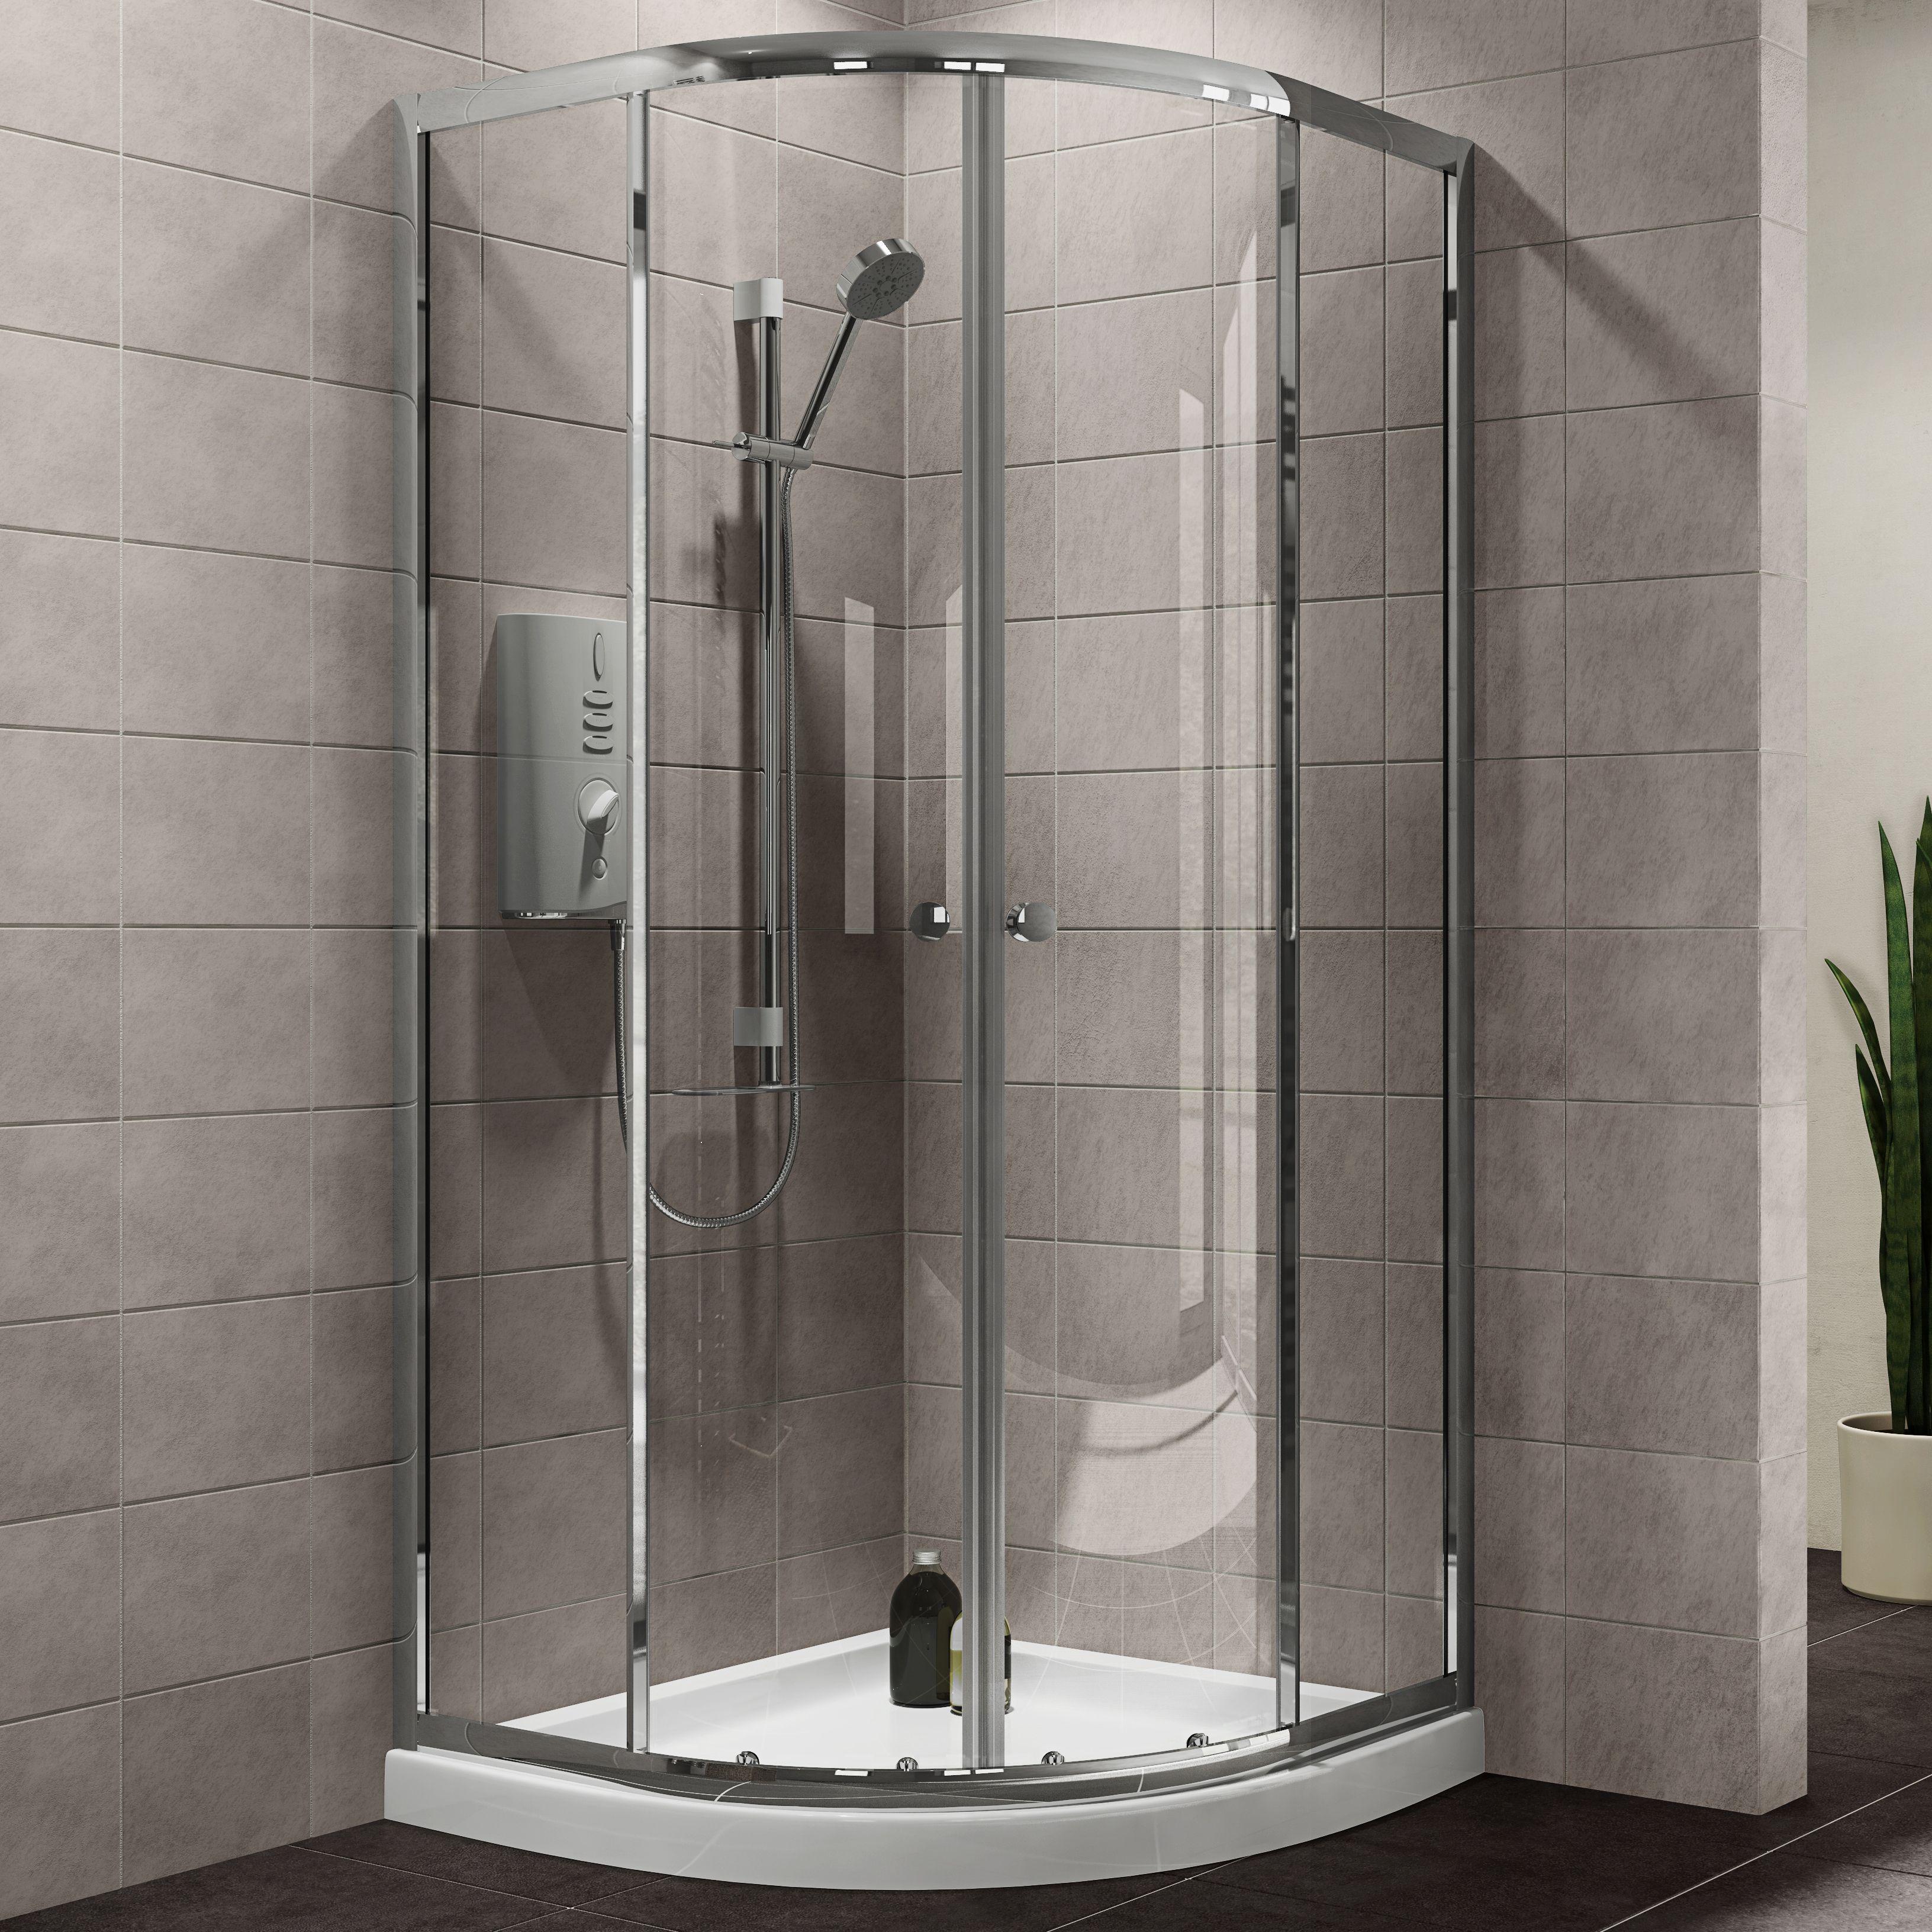 Plumbsure Quadrant Shower Enclosure With Double Sliding Doors (w)800mm (d)800mm